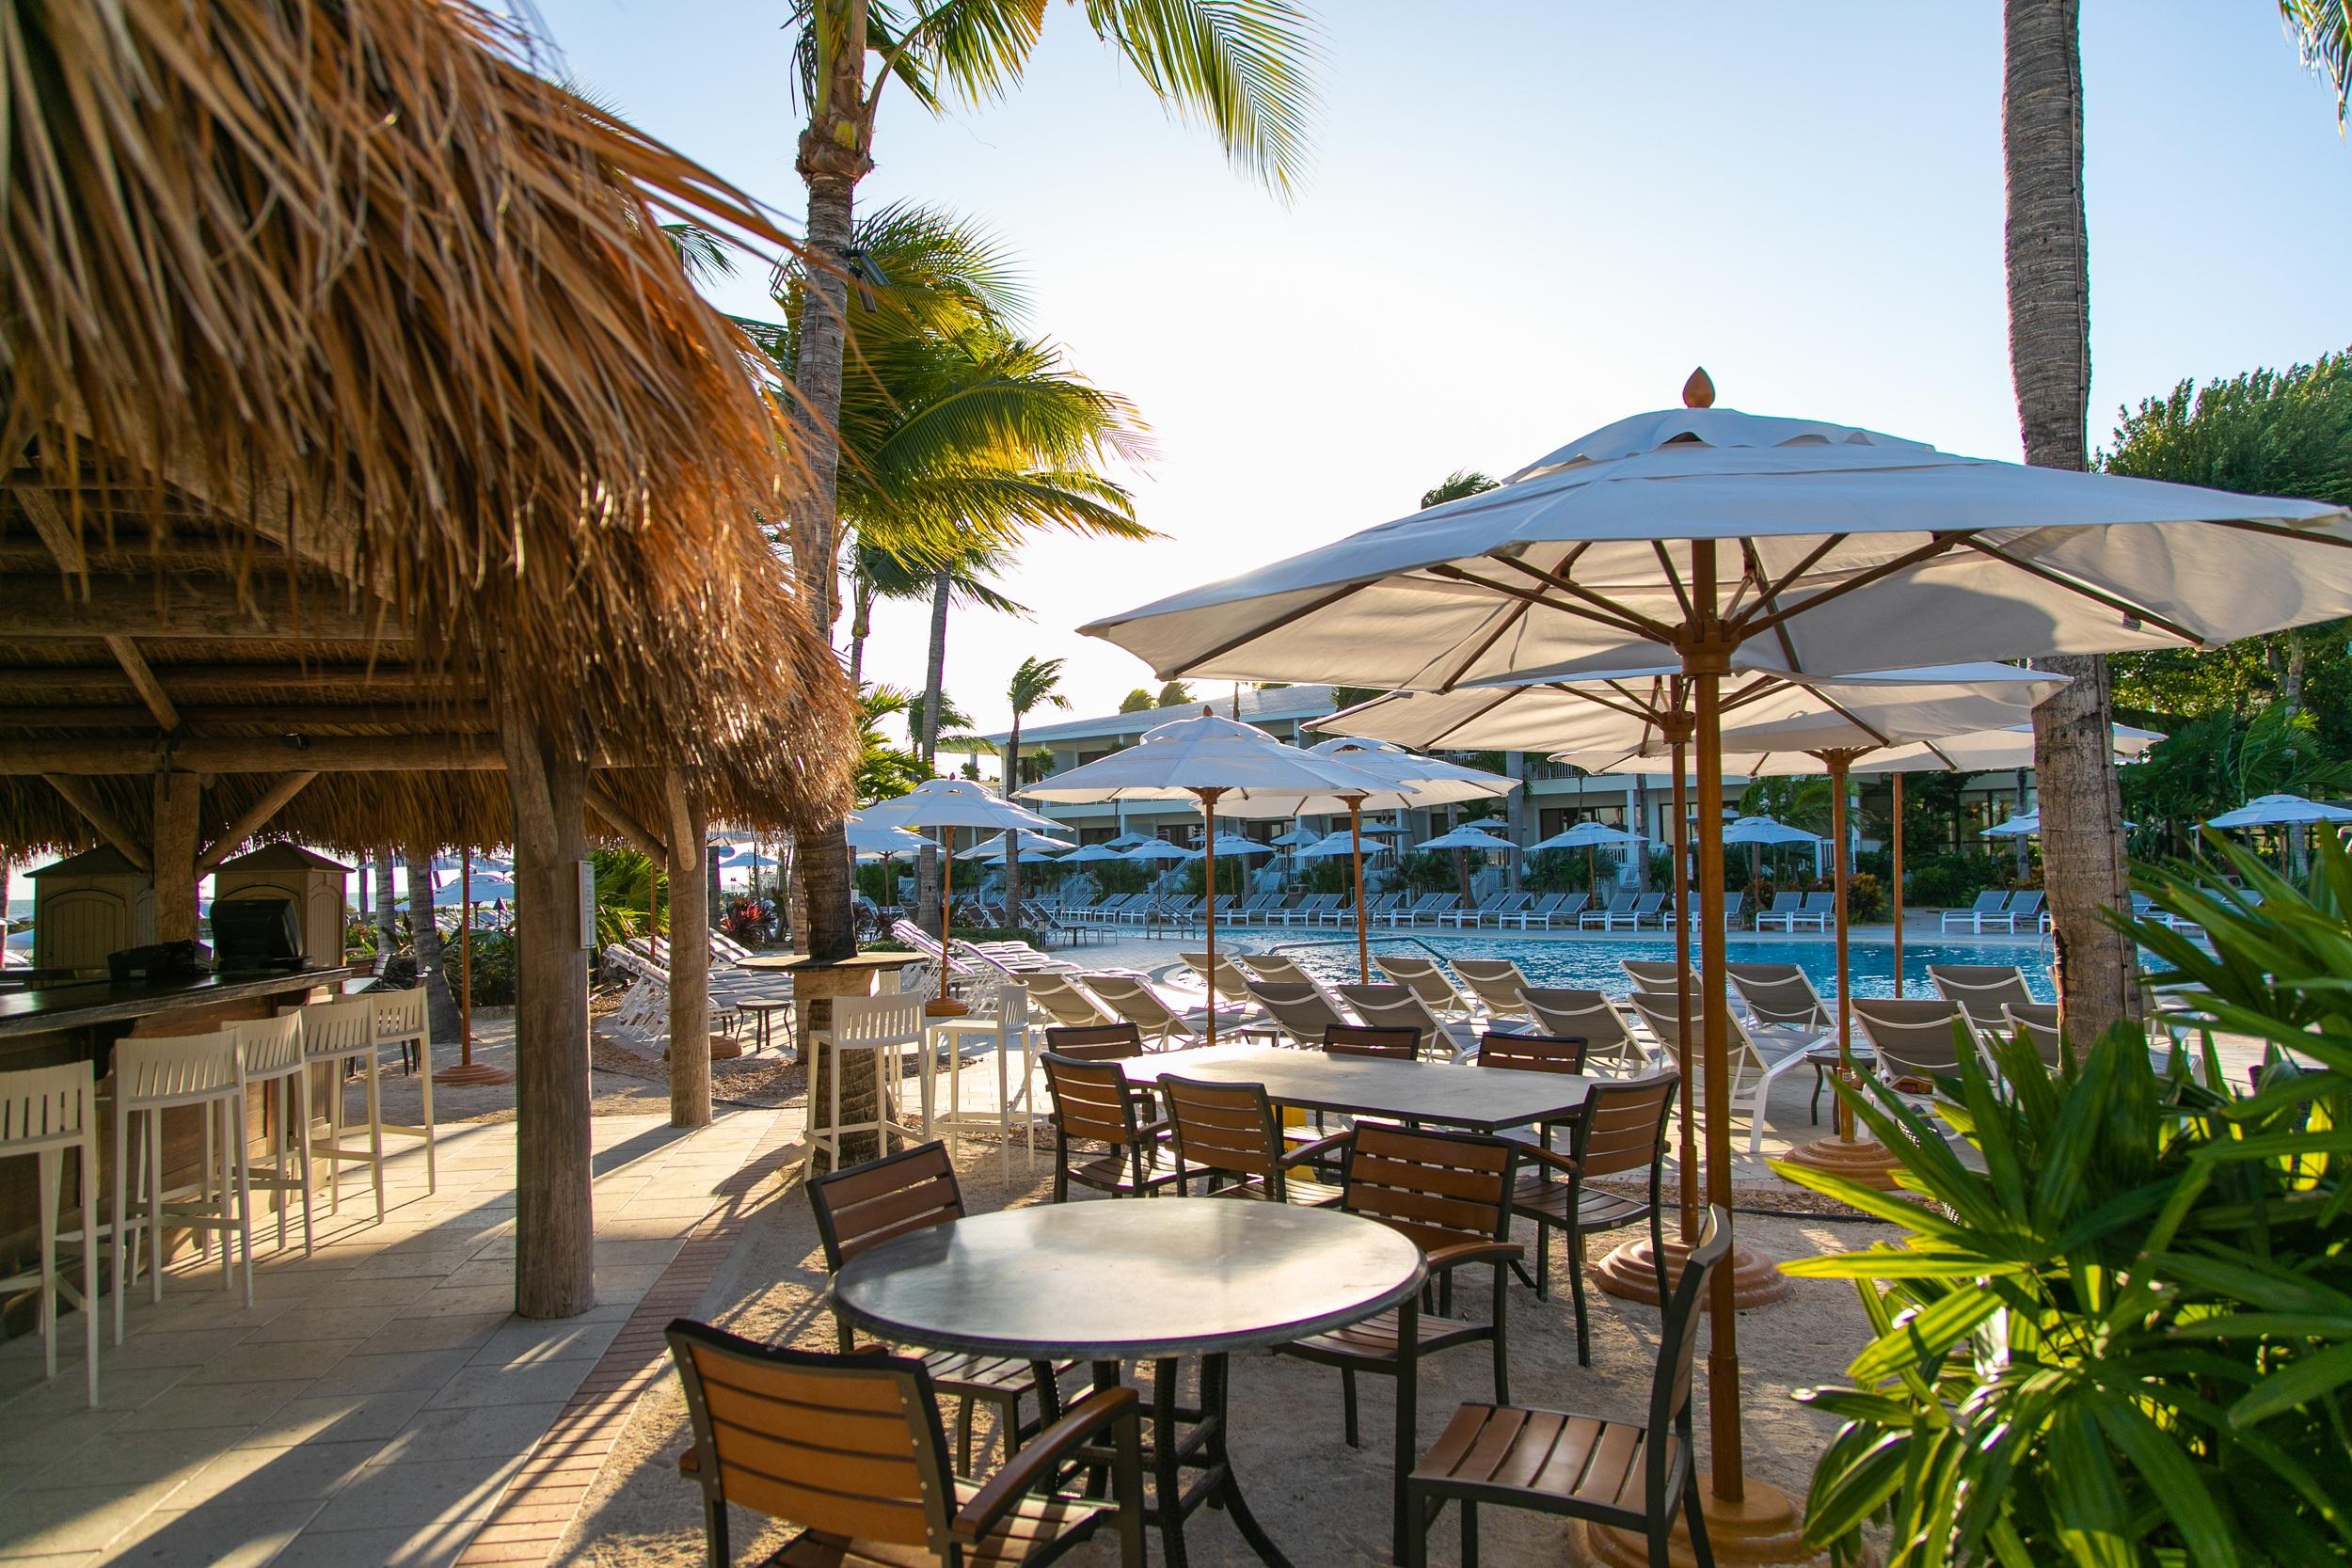 Tiki Grill near the Main Resort Pool at Hawks Cay Resort